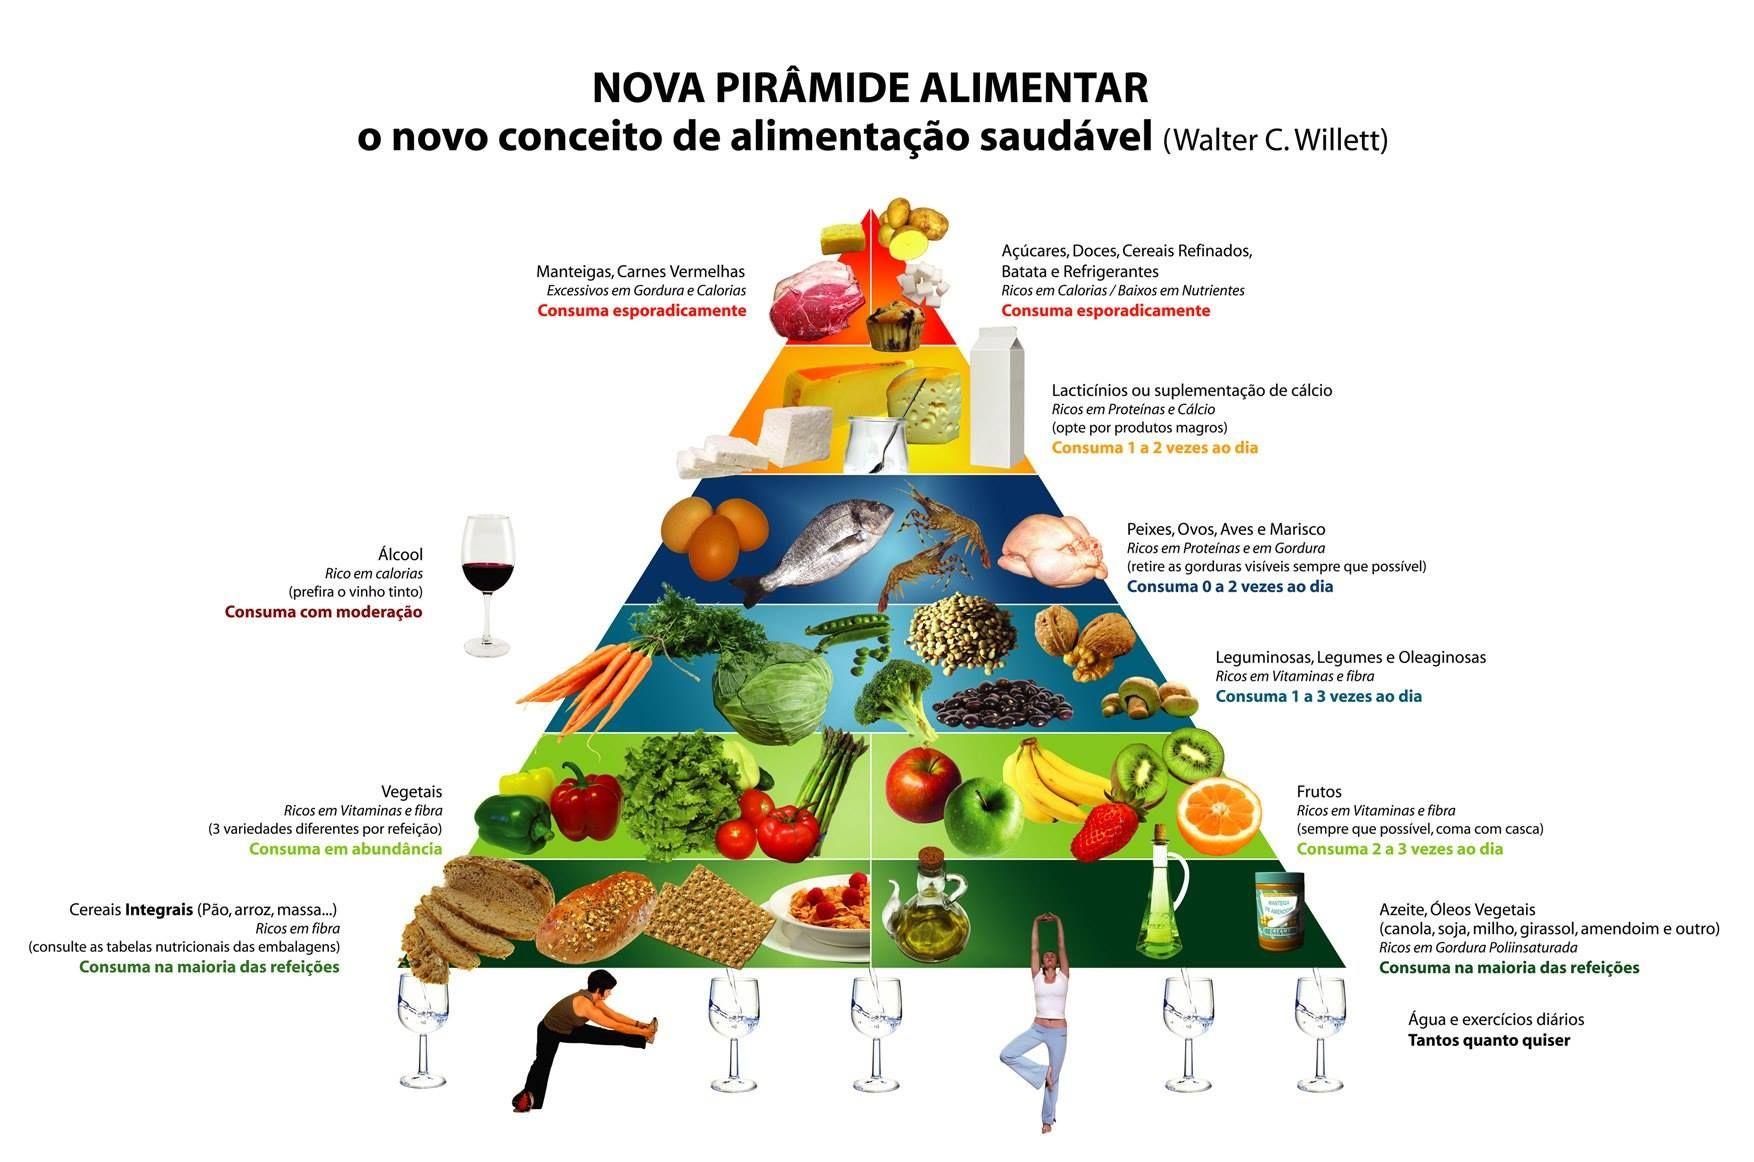 Alimentos saiba sobre a Nova Pirâmide Alimentar